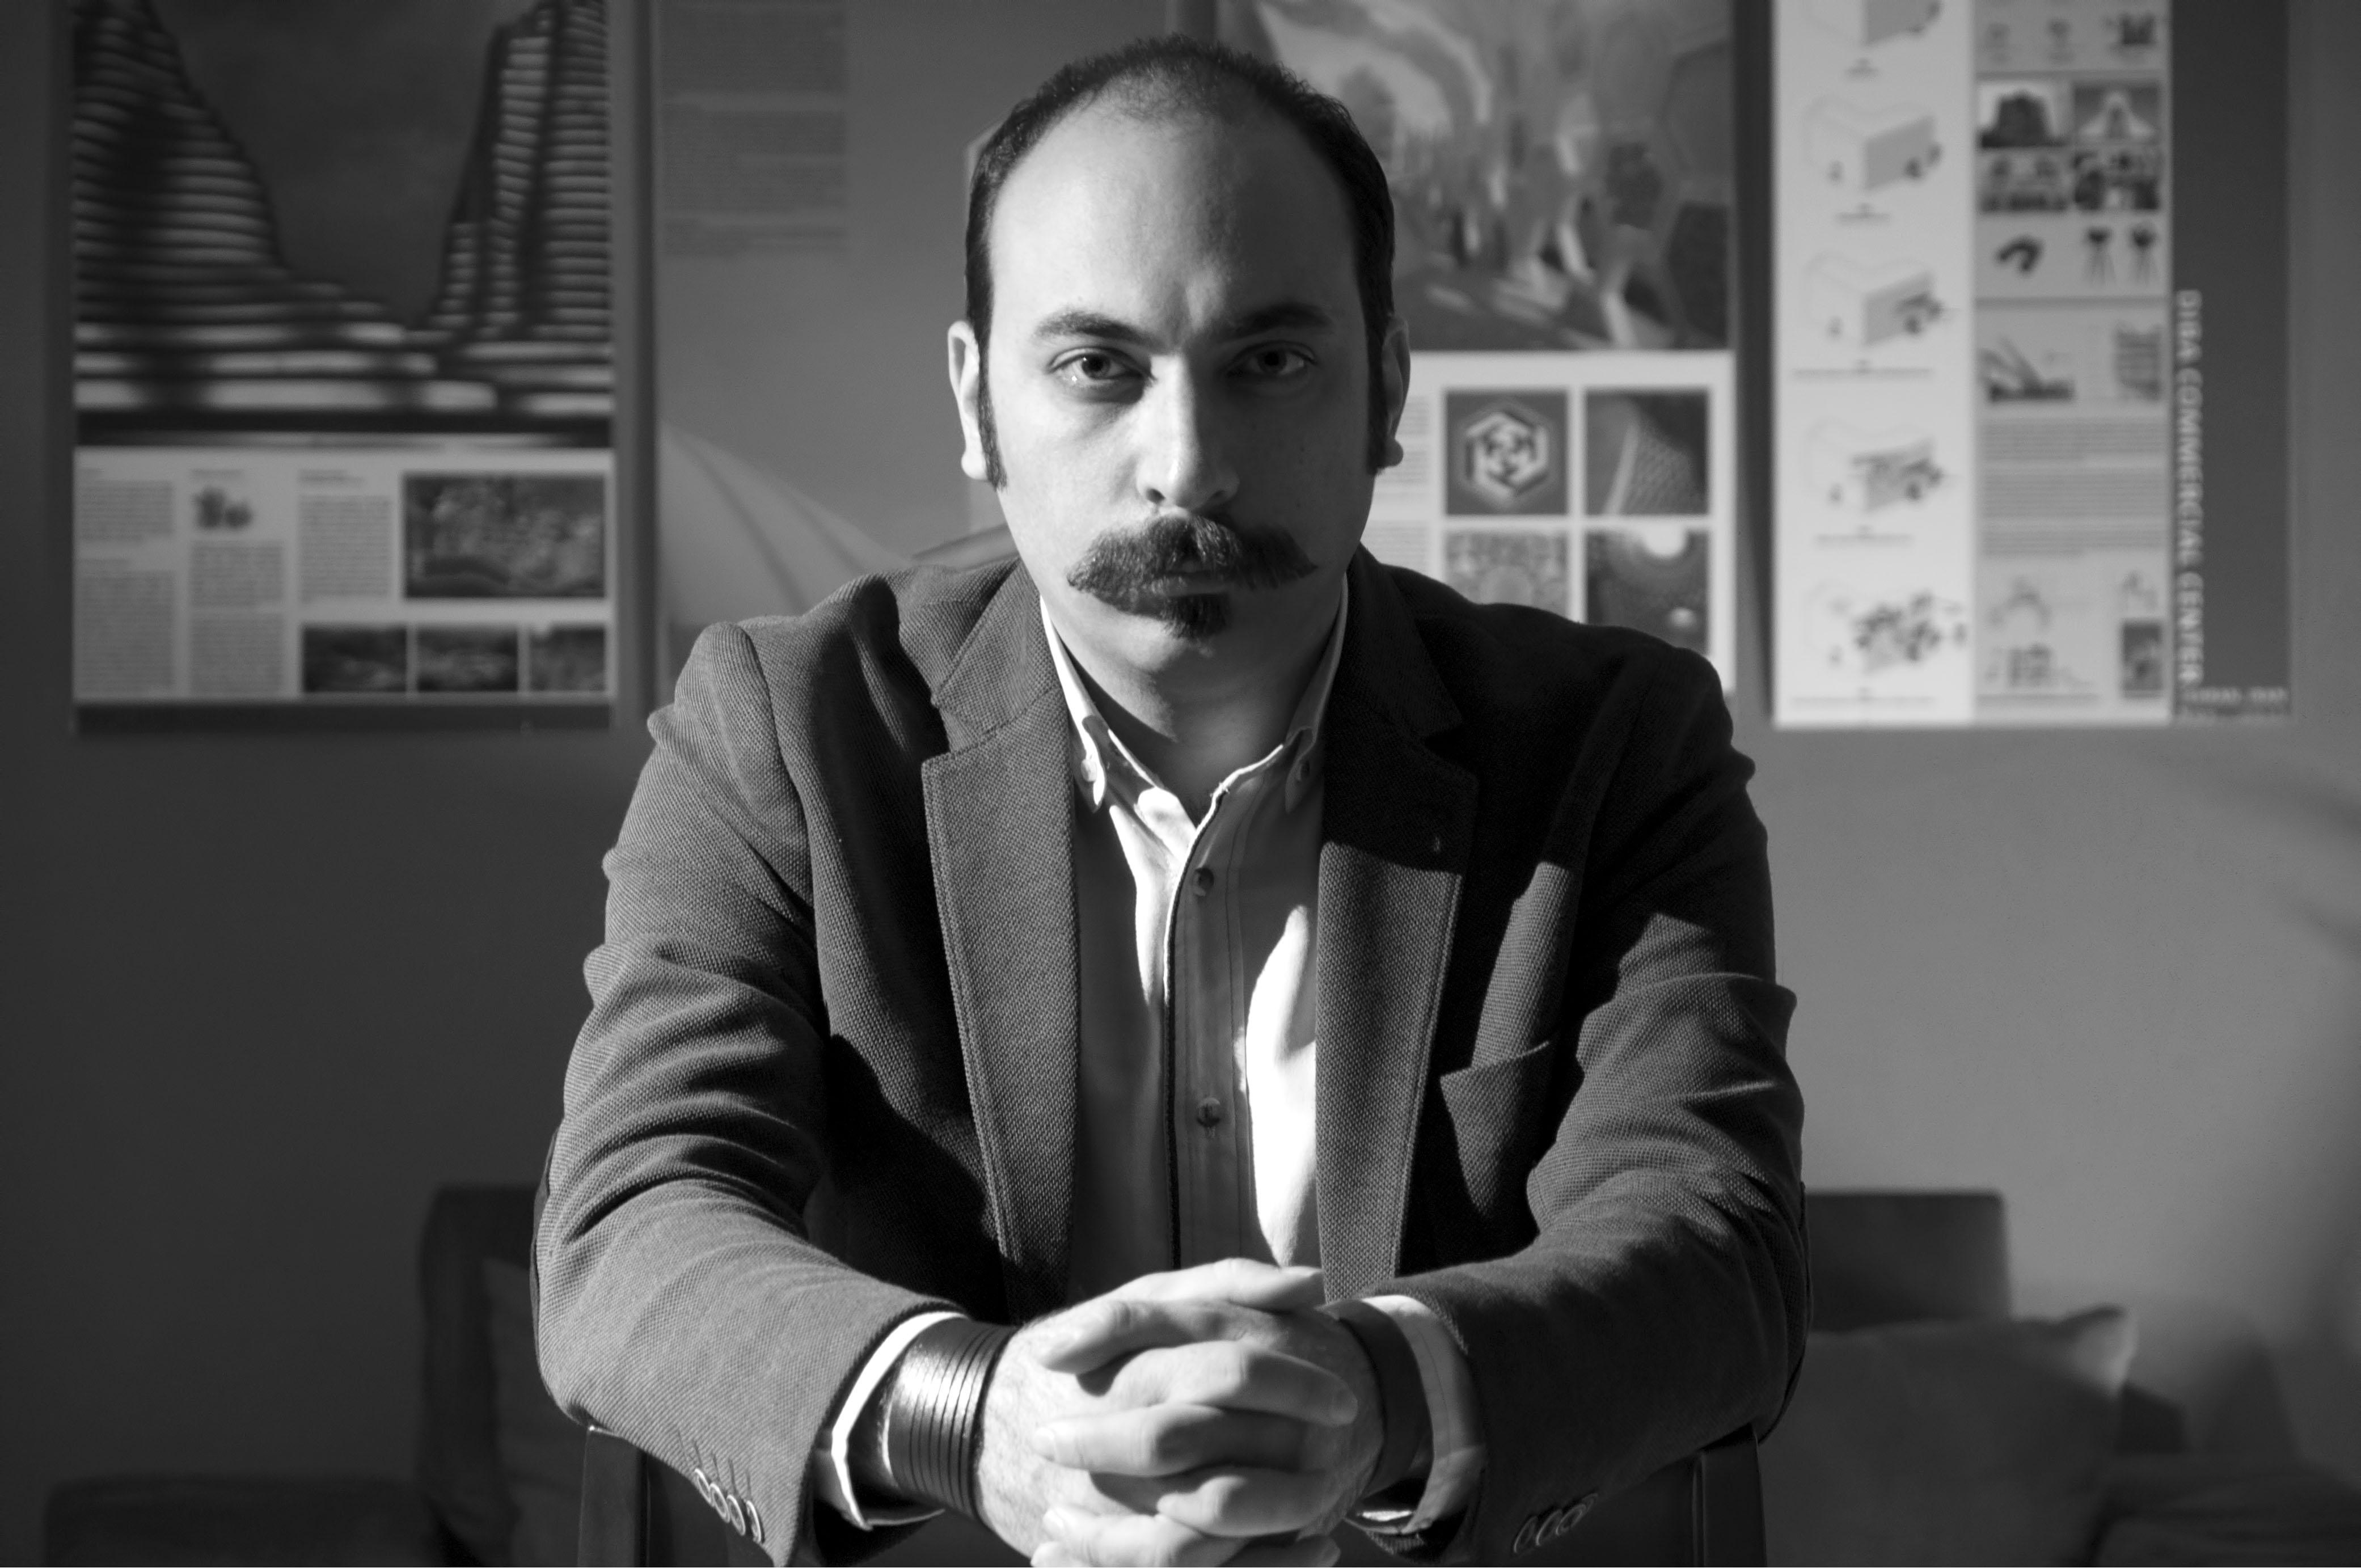 Arash G Tehrani - آرش غلامعلی طهرانی